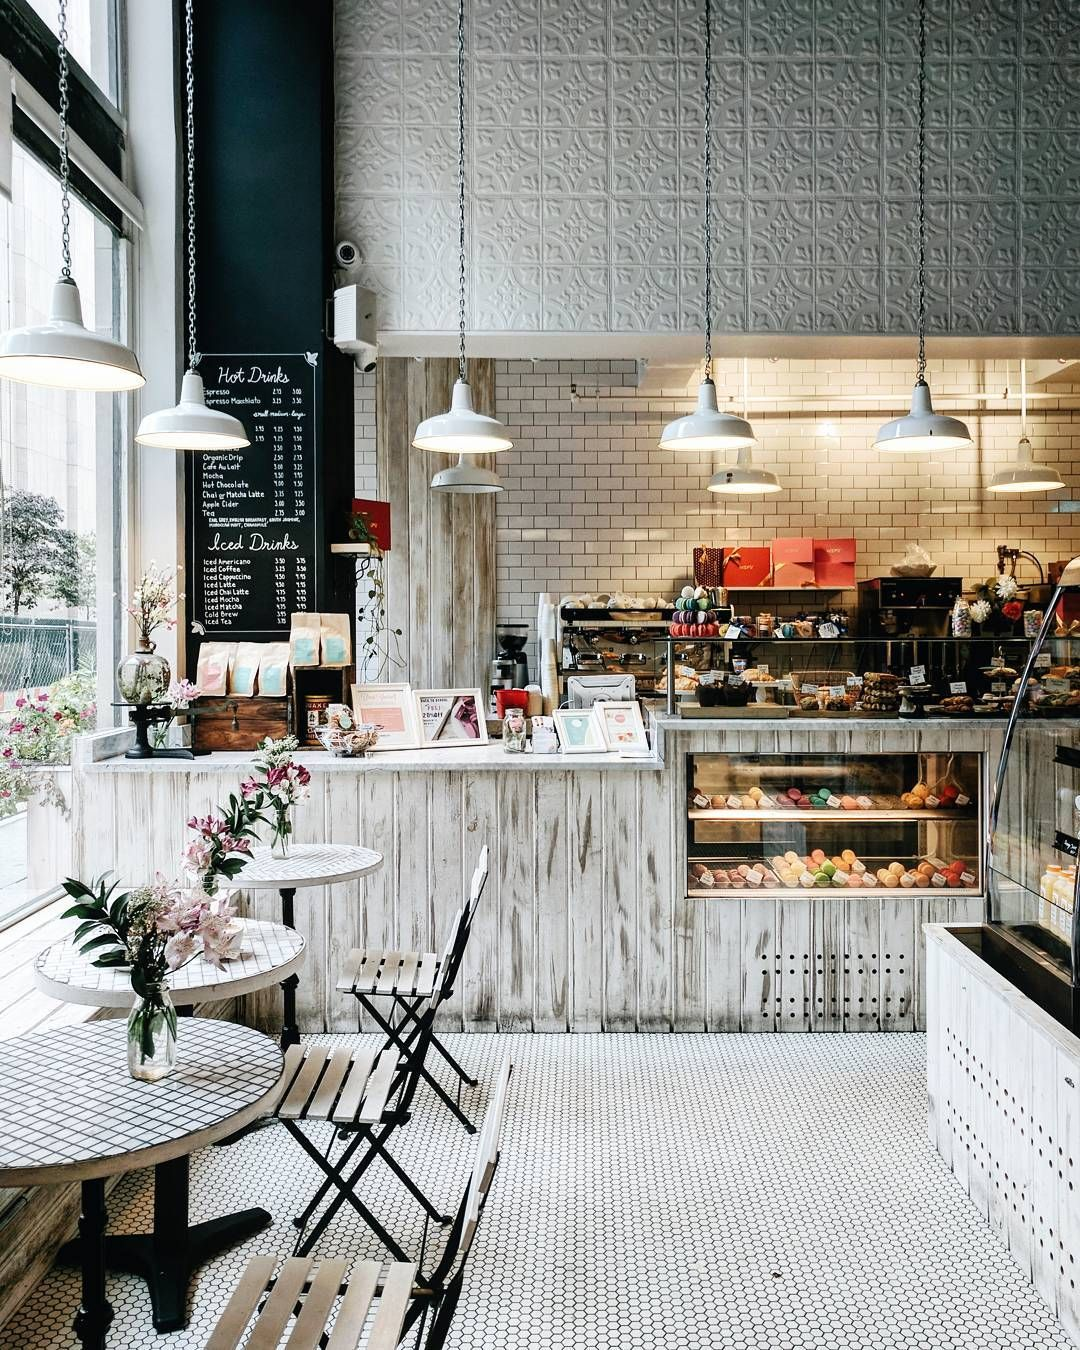 Woops nyc photo heydavina on instagram cafe